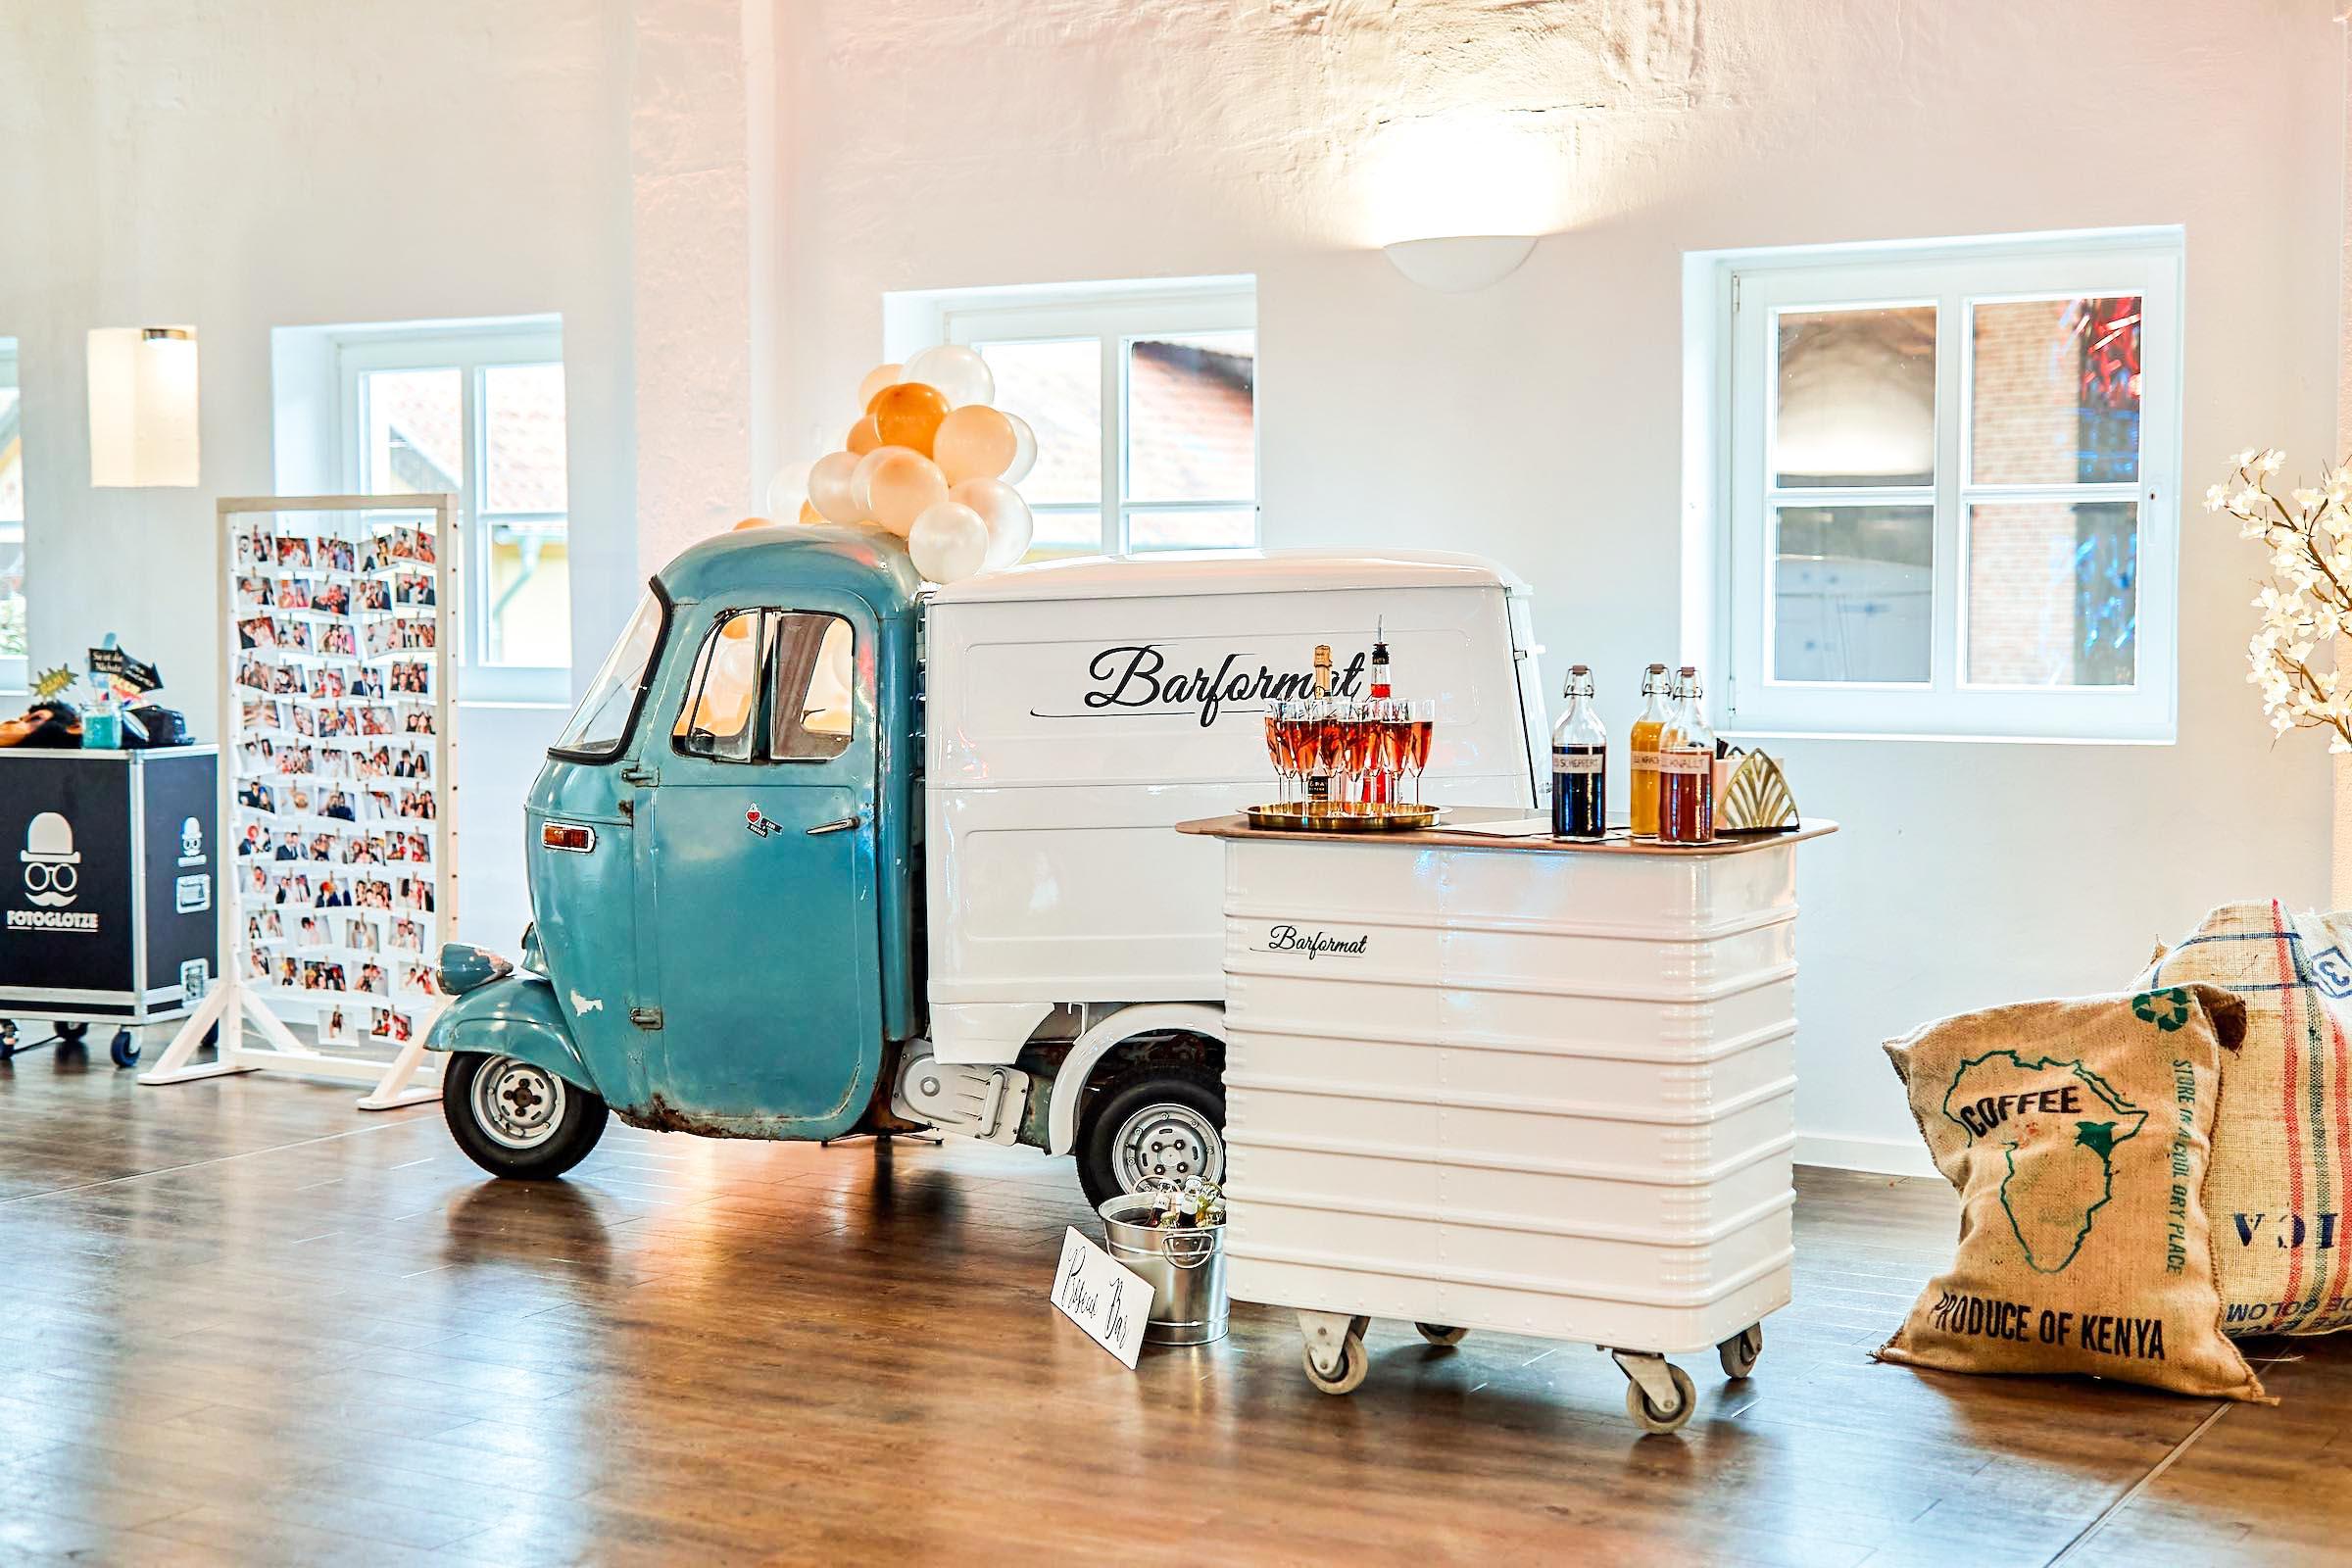 Mobile | Bar | Ape | Bulli | Cocktailservice | Hannover | Getränke | Catering | Foodtruck | Kuchen | Sektempfang | Standesamt | Hochzeit | Barkeeper | Hochzeit | Event | Mieten | Buchen | Barformat